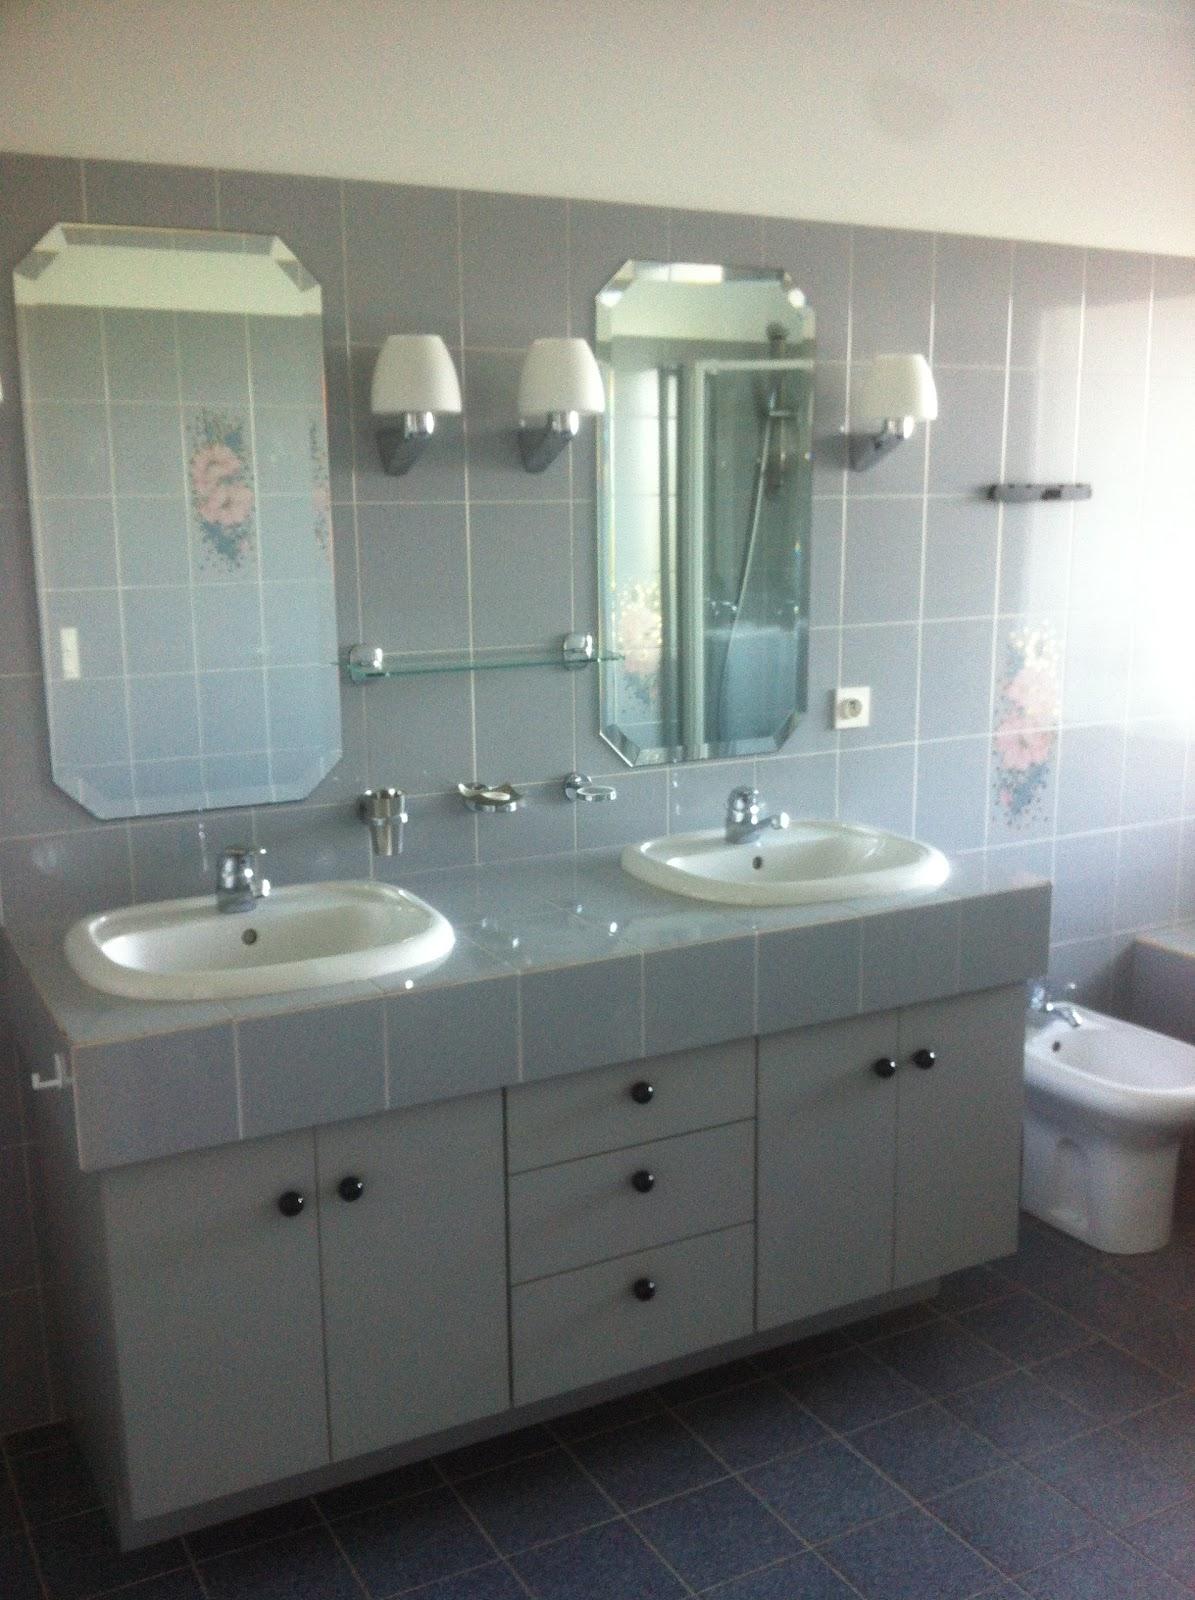 Architecture d 39 int rieur salle de bain ann es 70 for Salle de bain annee 30